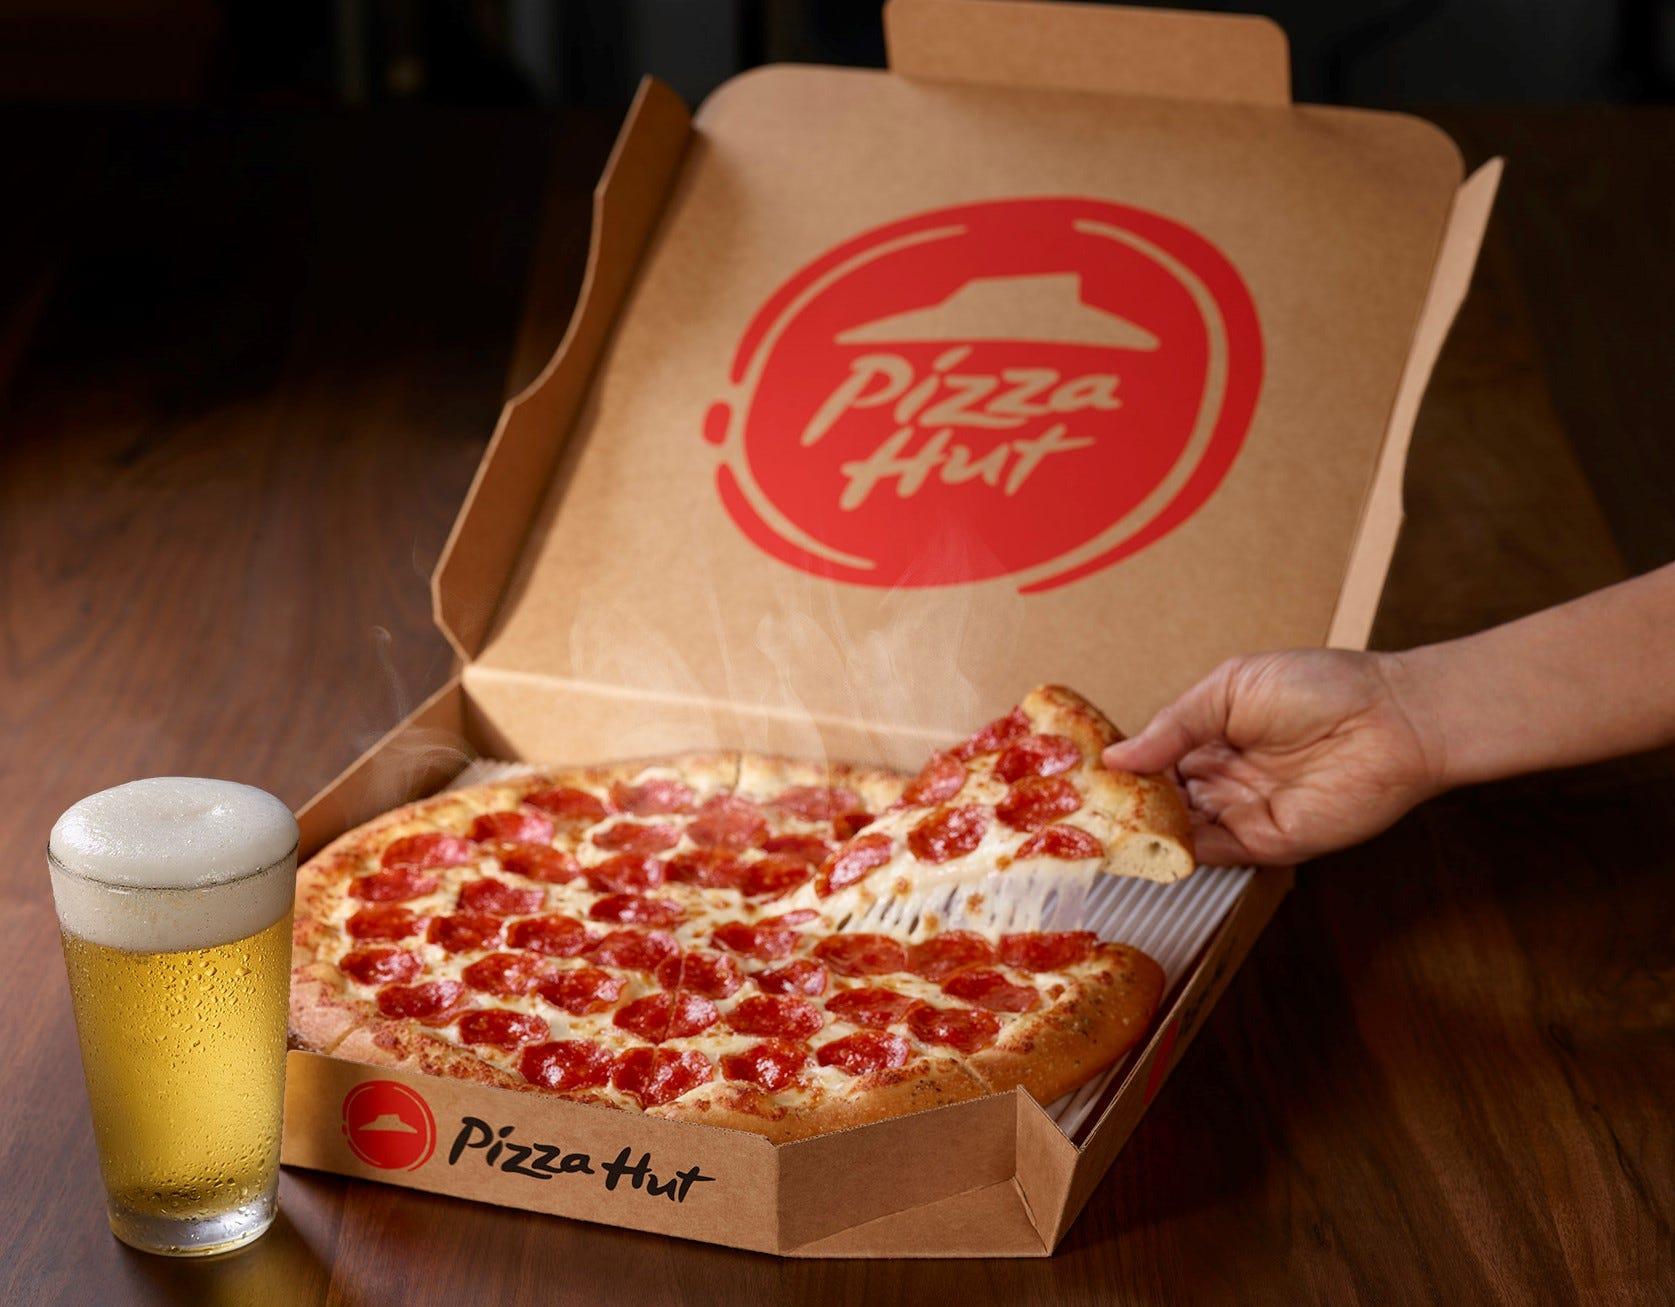 Super Bowl and pizza: Say hello to Pizza Hut Hut